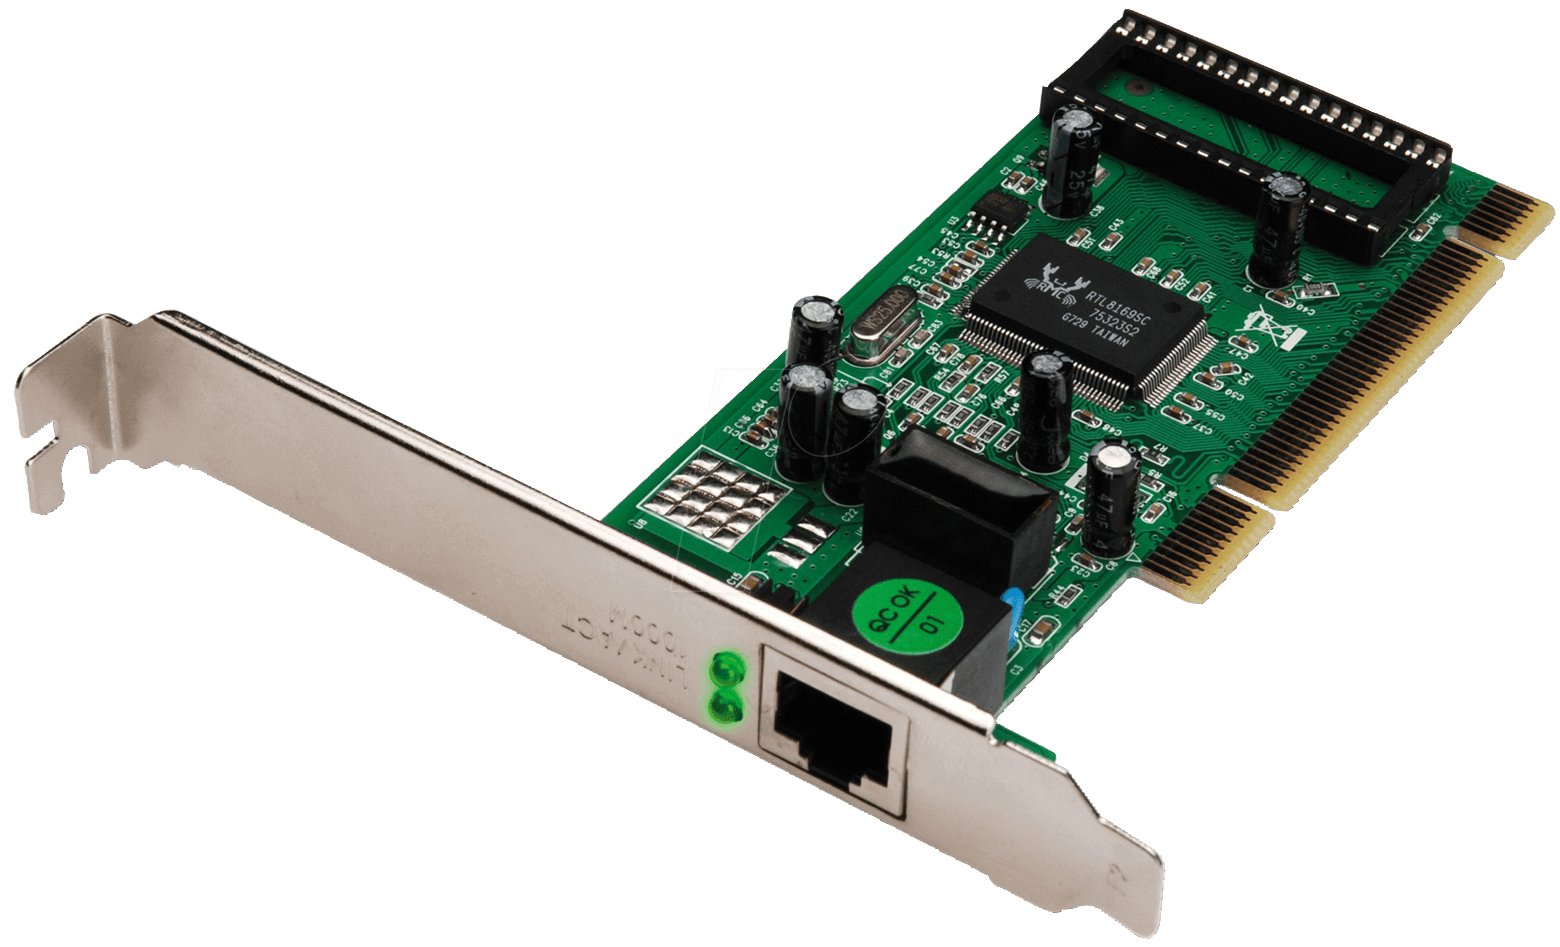 Digitus Dn 10110 Gigabit Ethernet Pci Network Interface